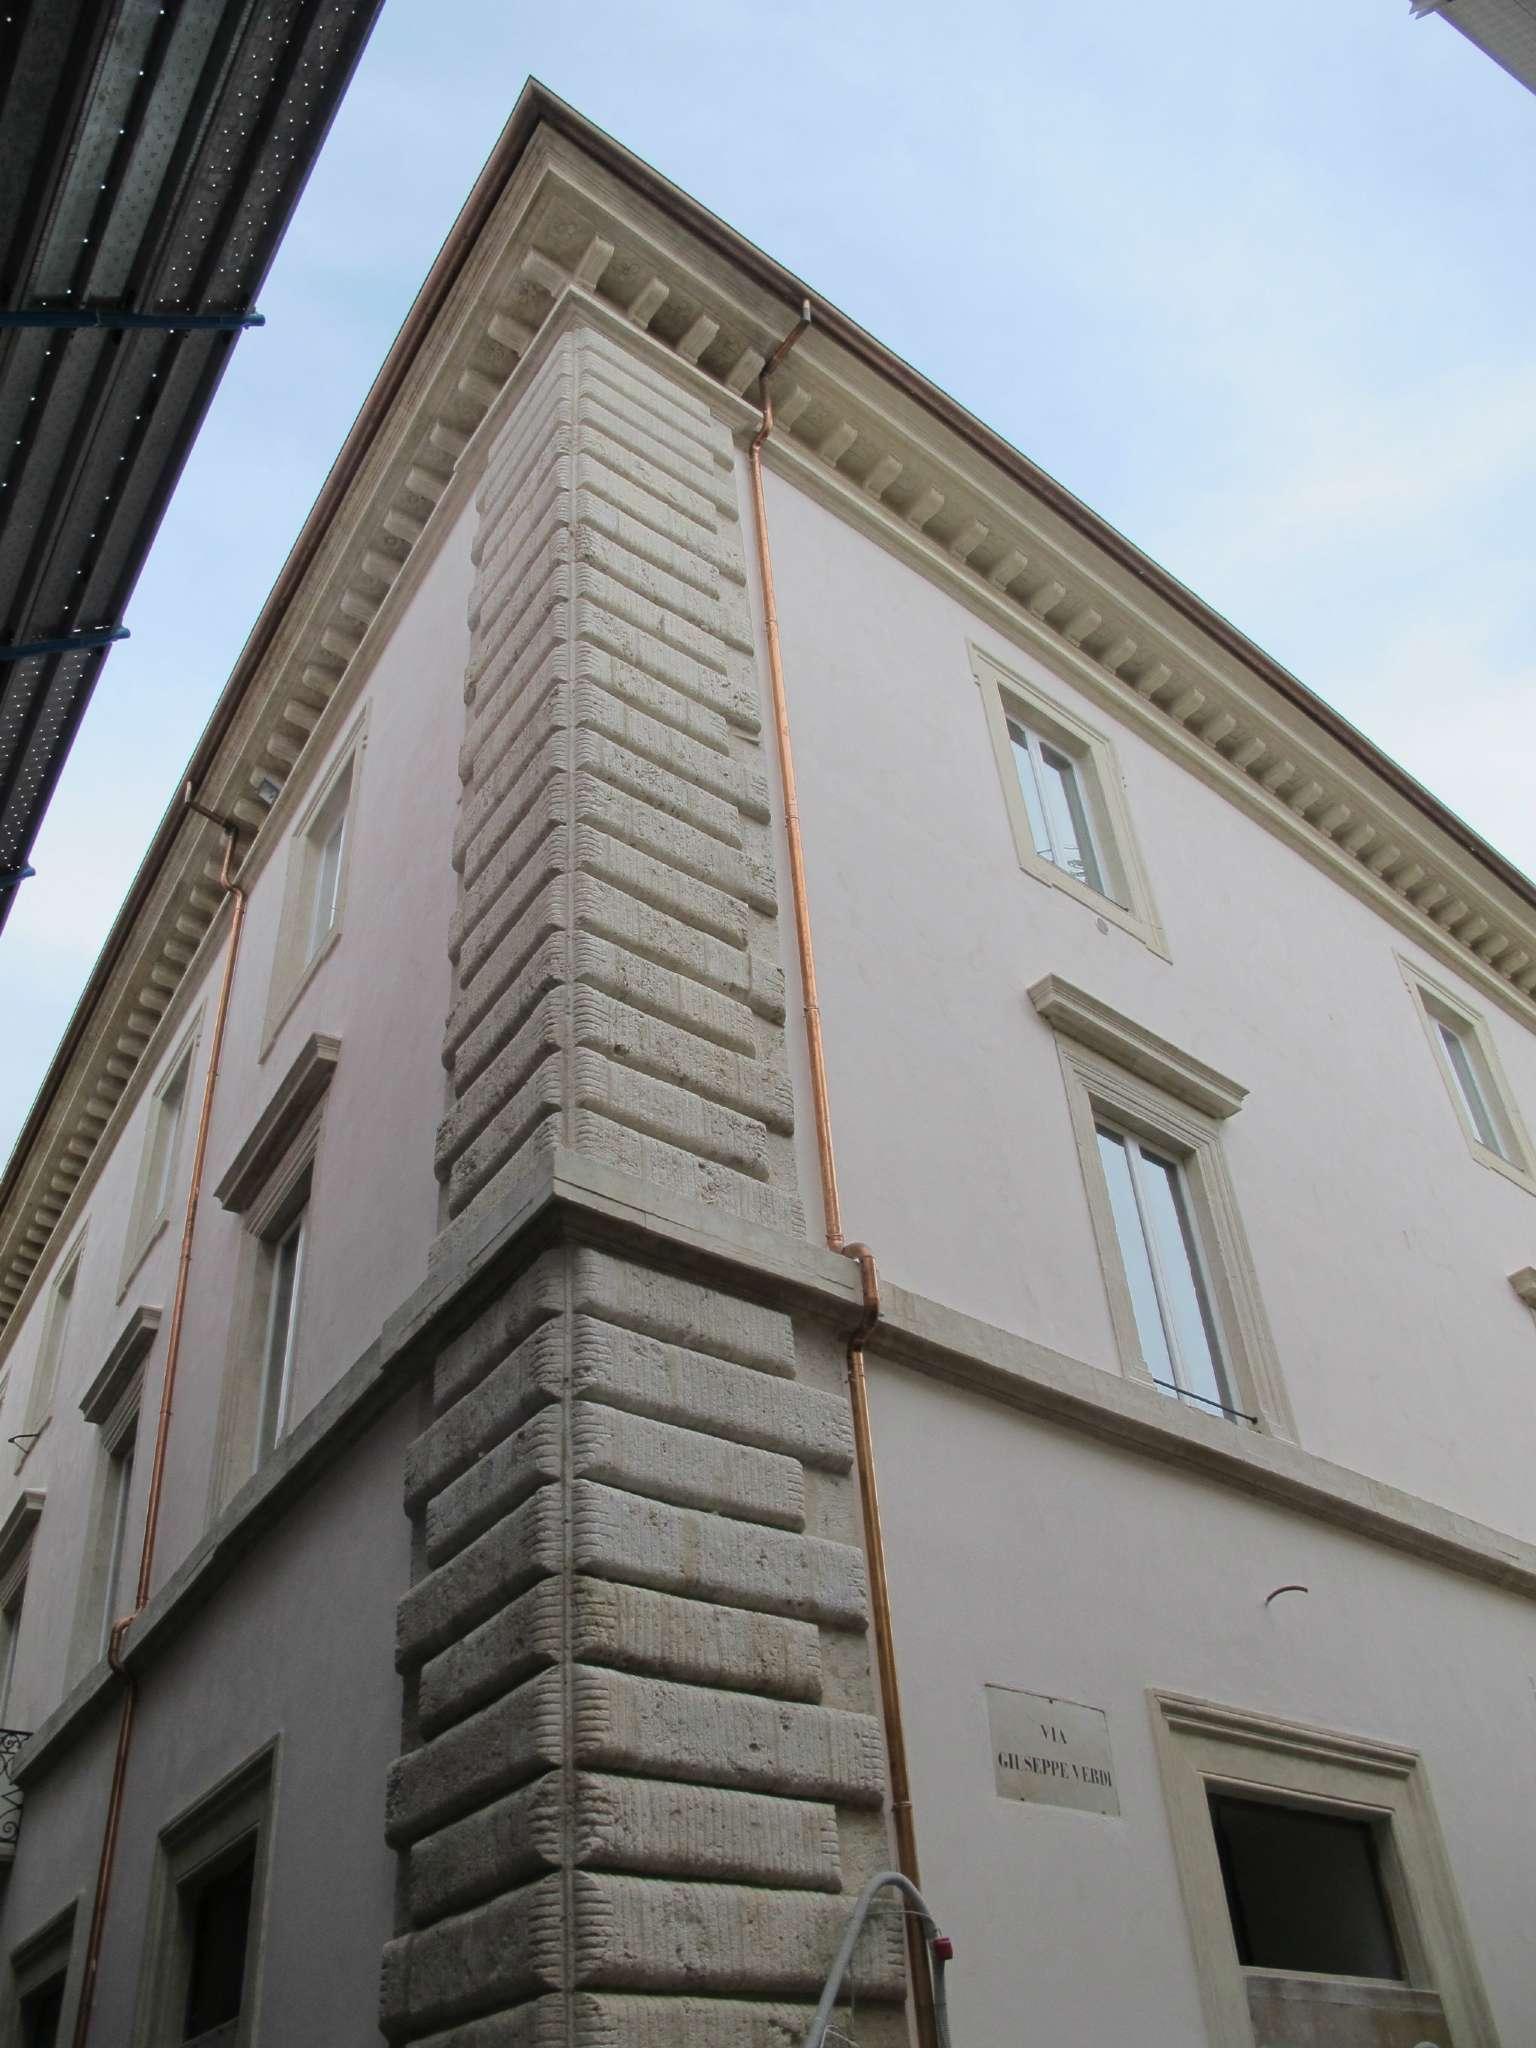 Appartamento, Vittorio Emanuele, centro storico, Vendita - L'aquila (L'Aquila)